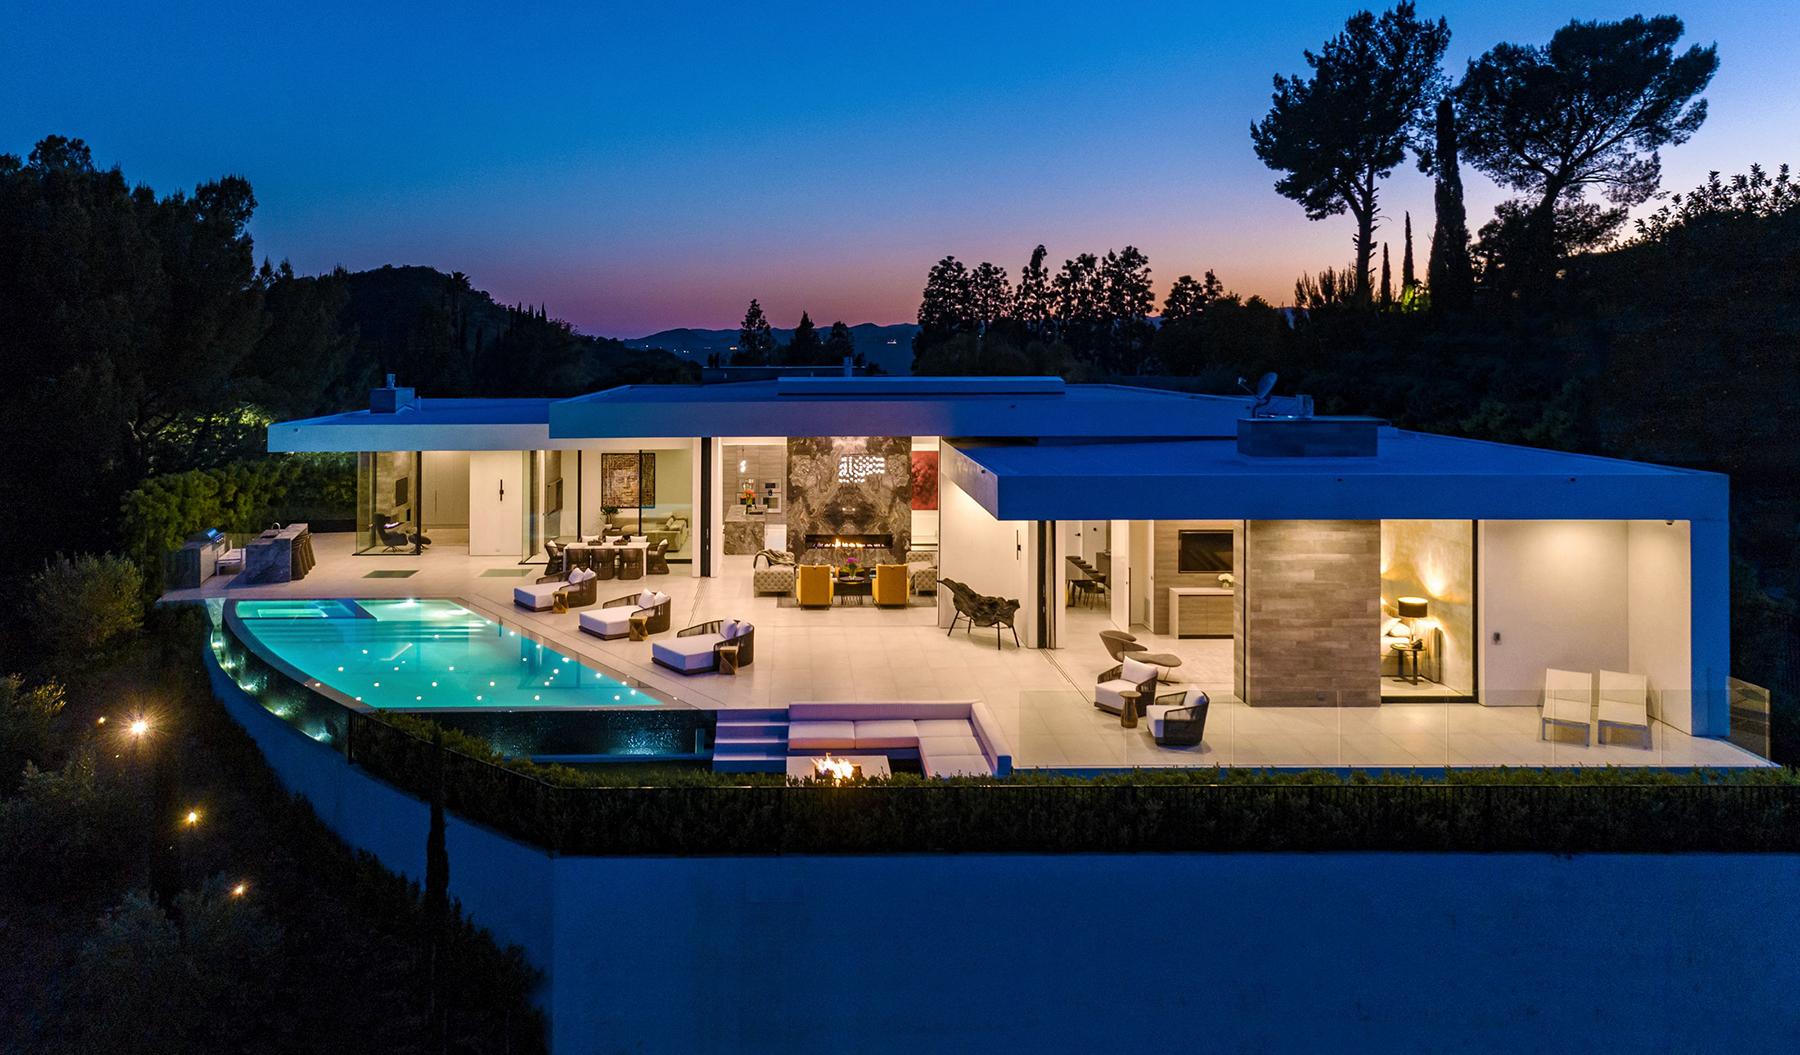 2200 SUMMITRIDGE DR, BEVERLY HILLS, CA 90210 – $18,995,000